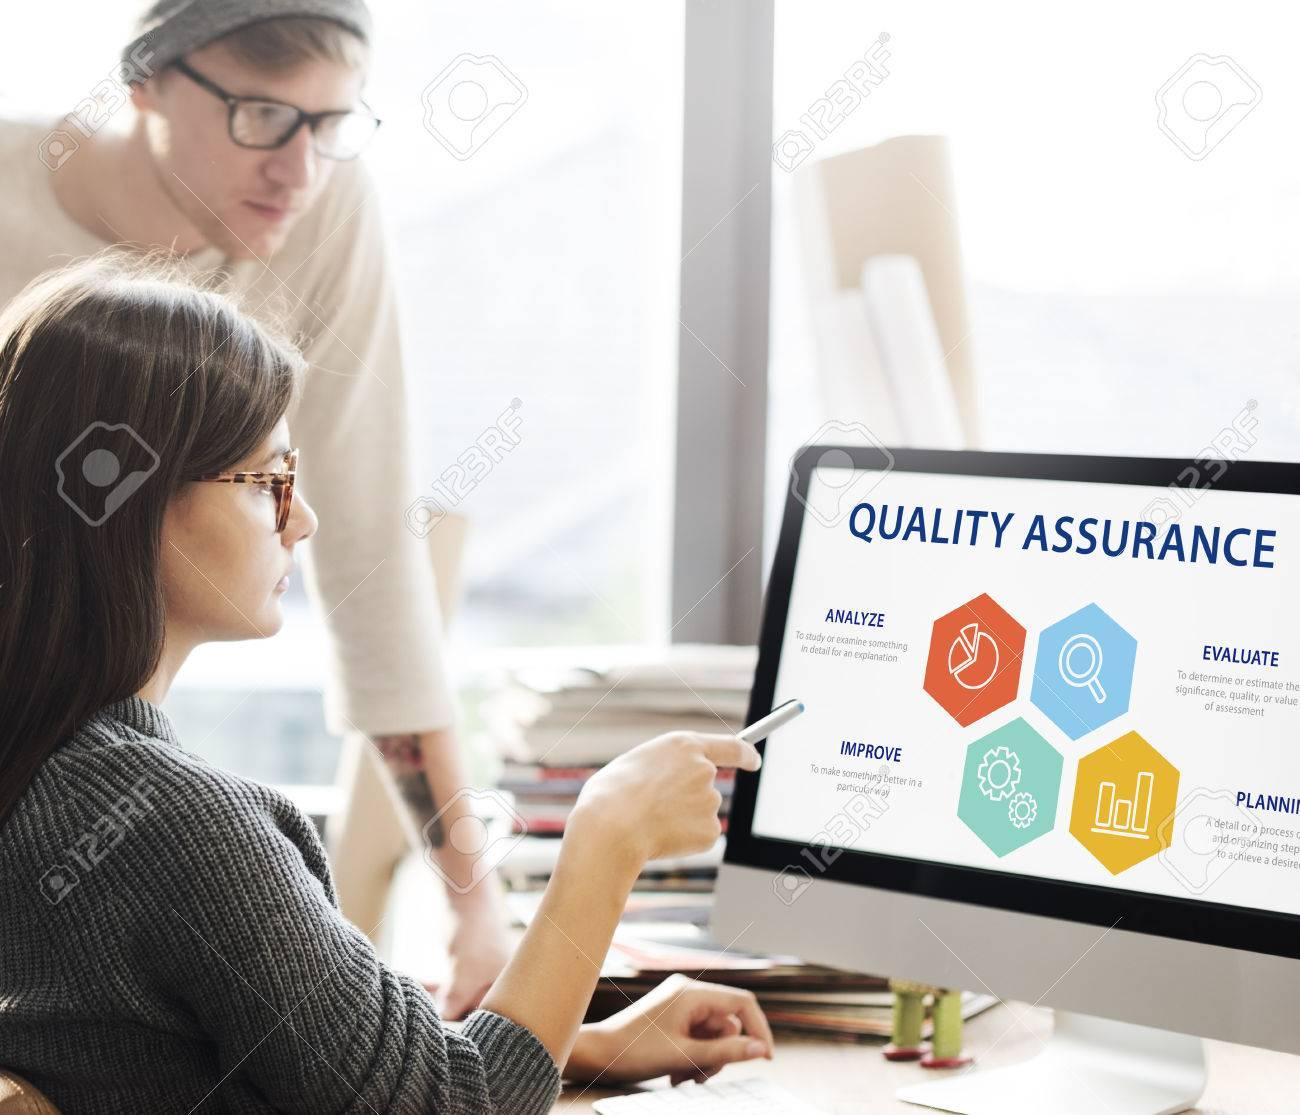 Quality Assurance Guarantee Warranty Trustworthy Concept Standard-Bild - 68845891